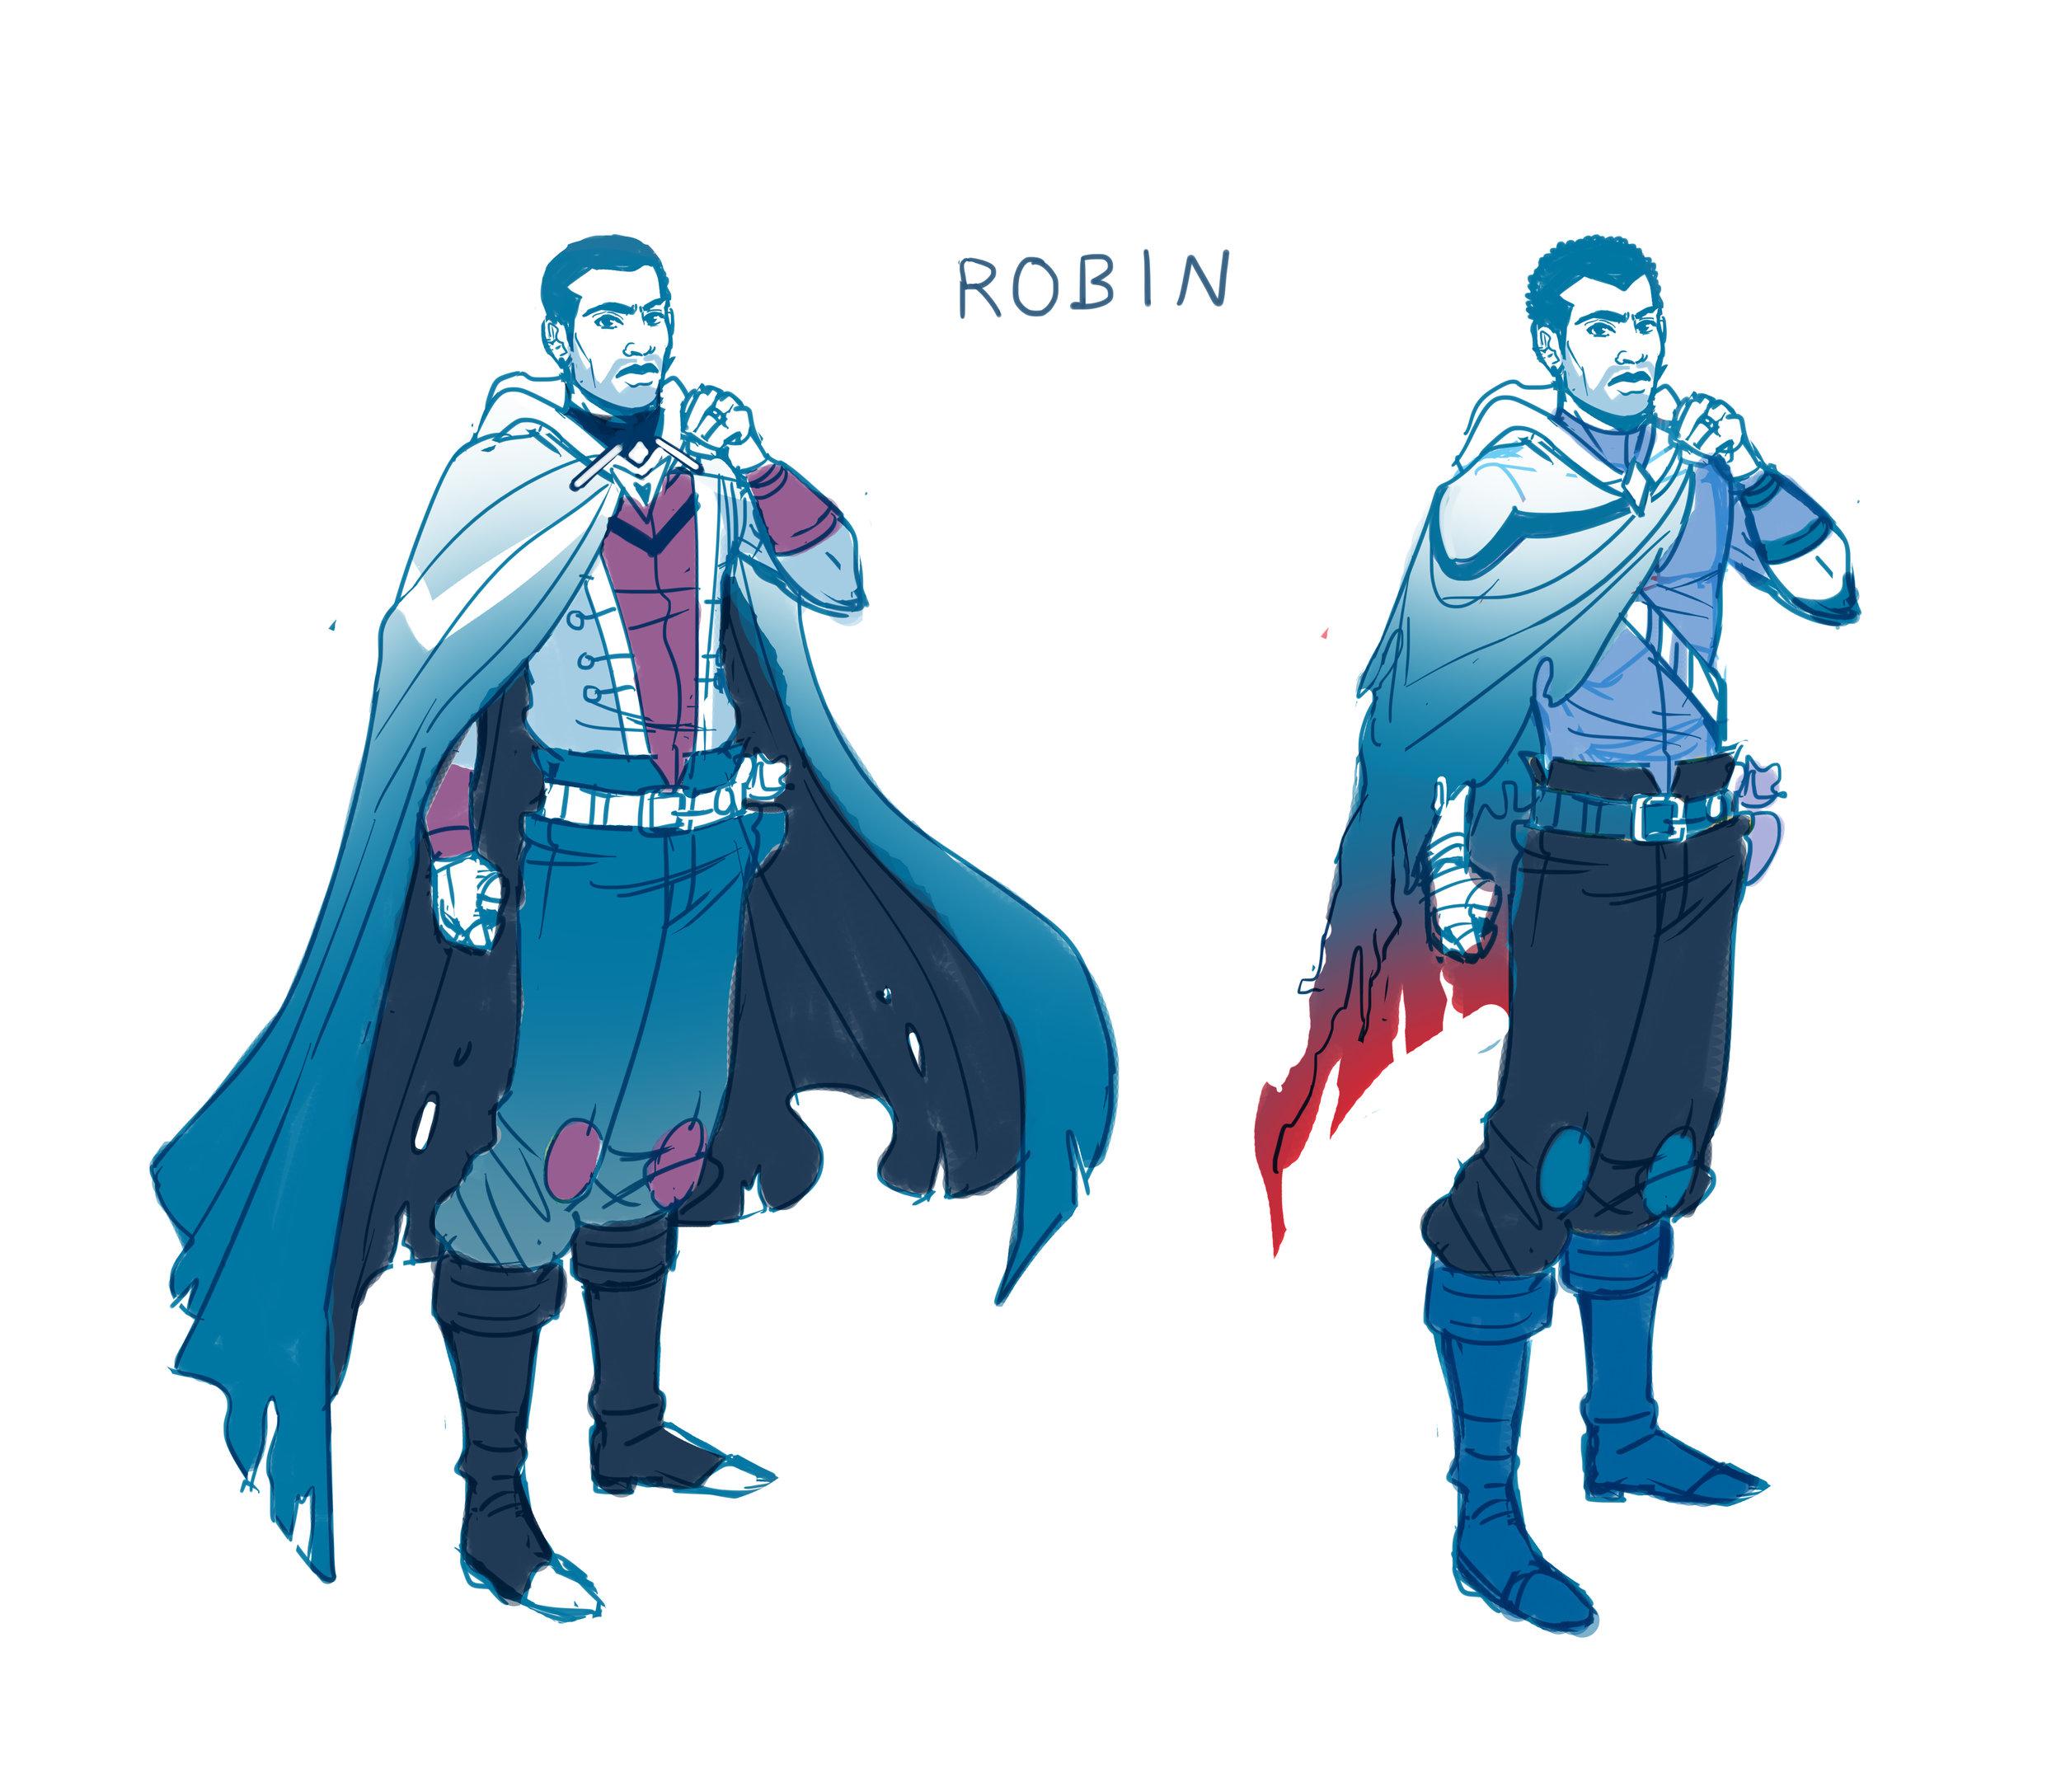 Robin character design.